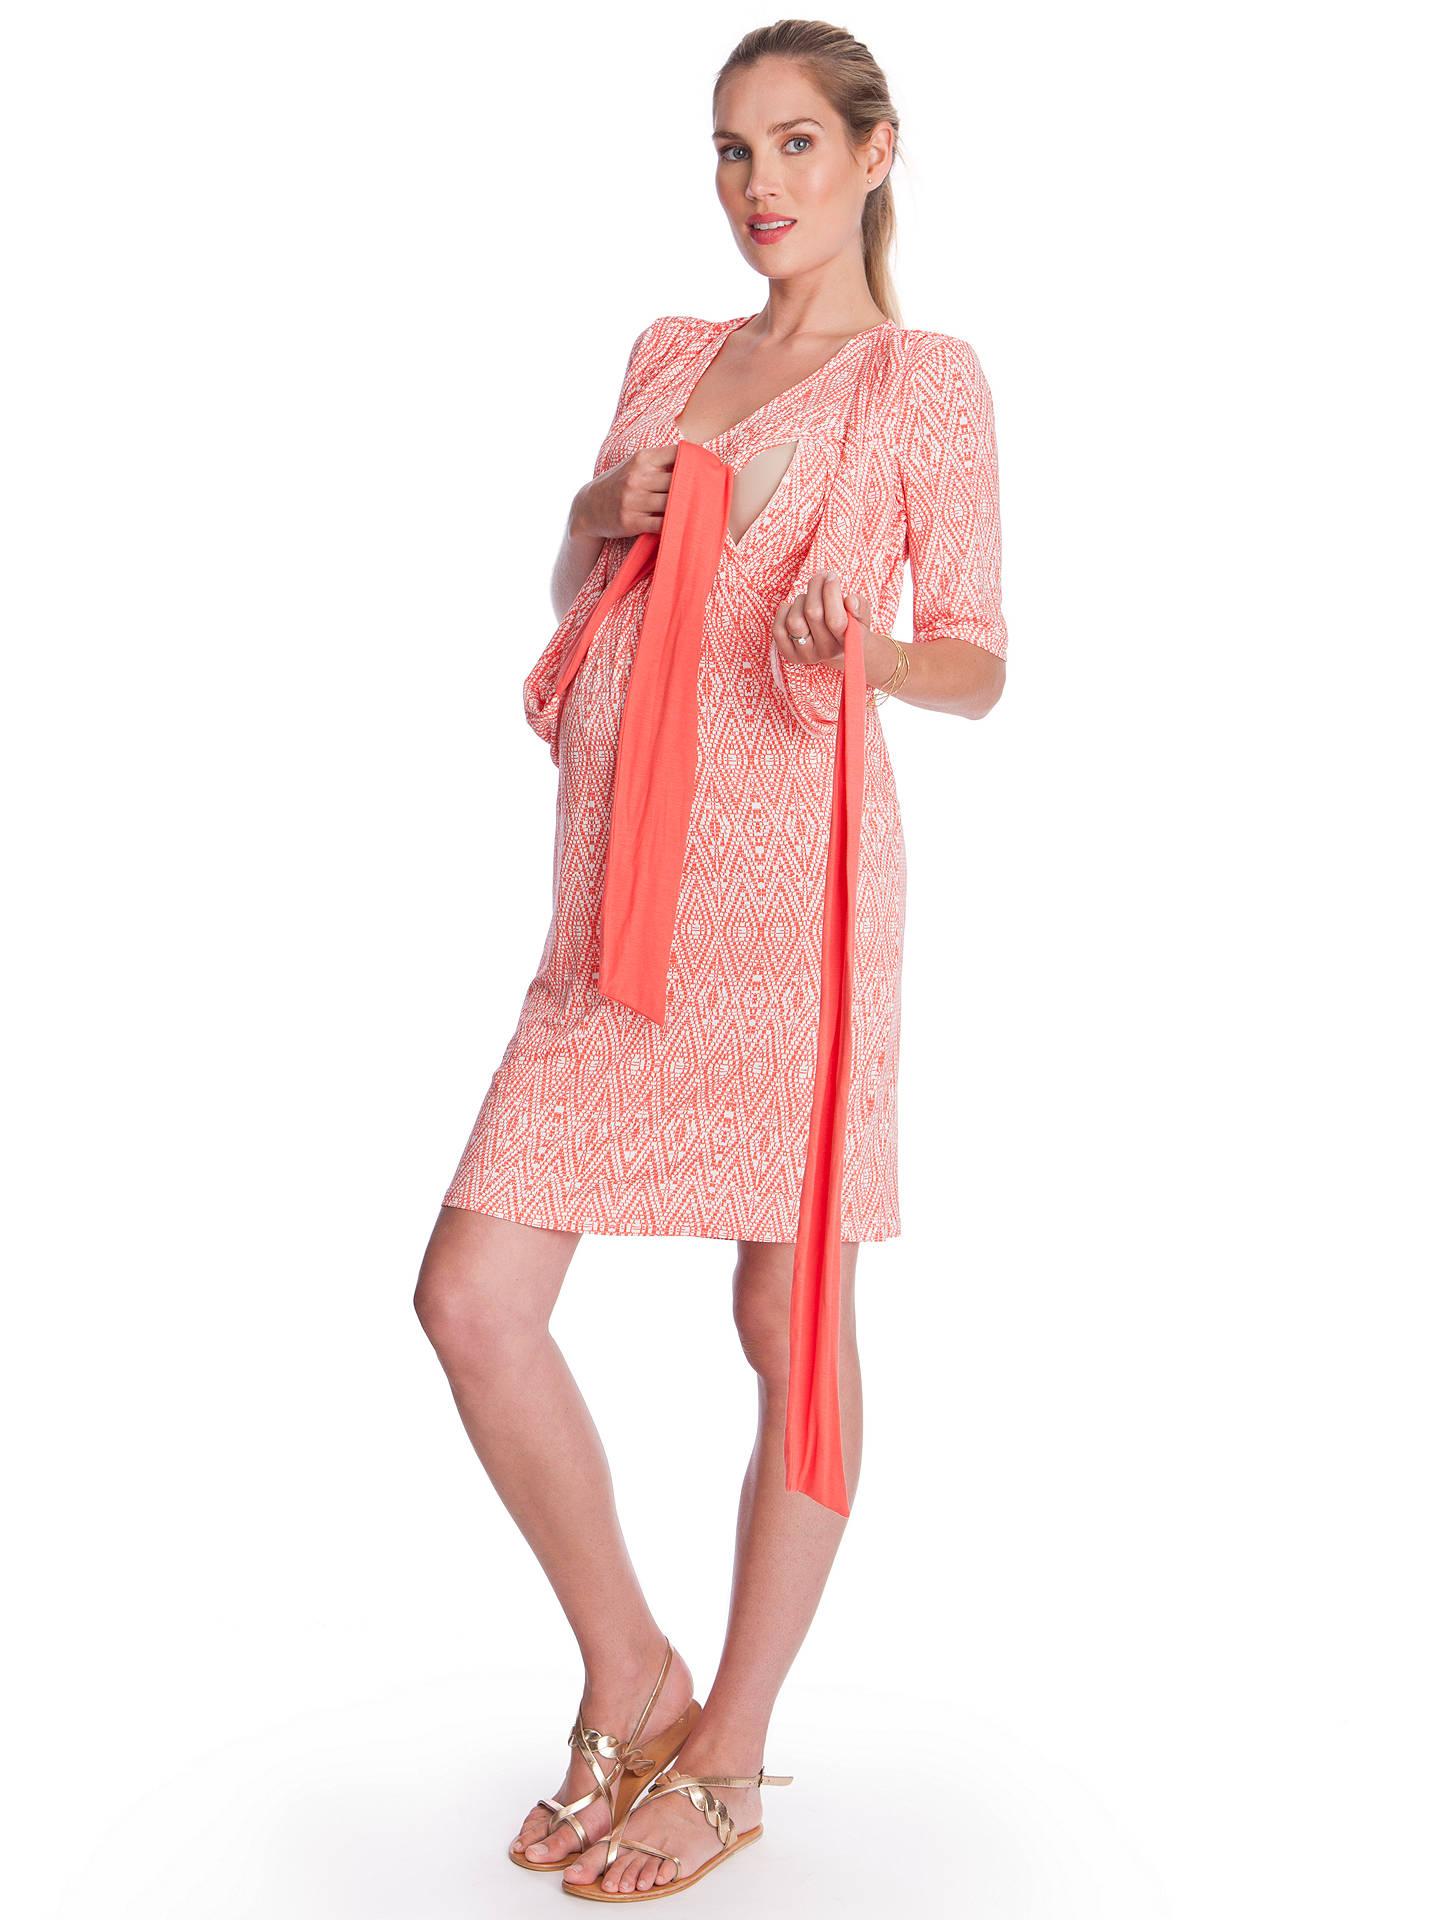 Seraphine Callie Maternity Nursing Dress Coral At John Lewis Partners